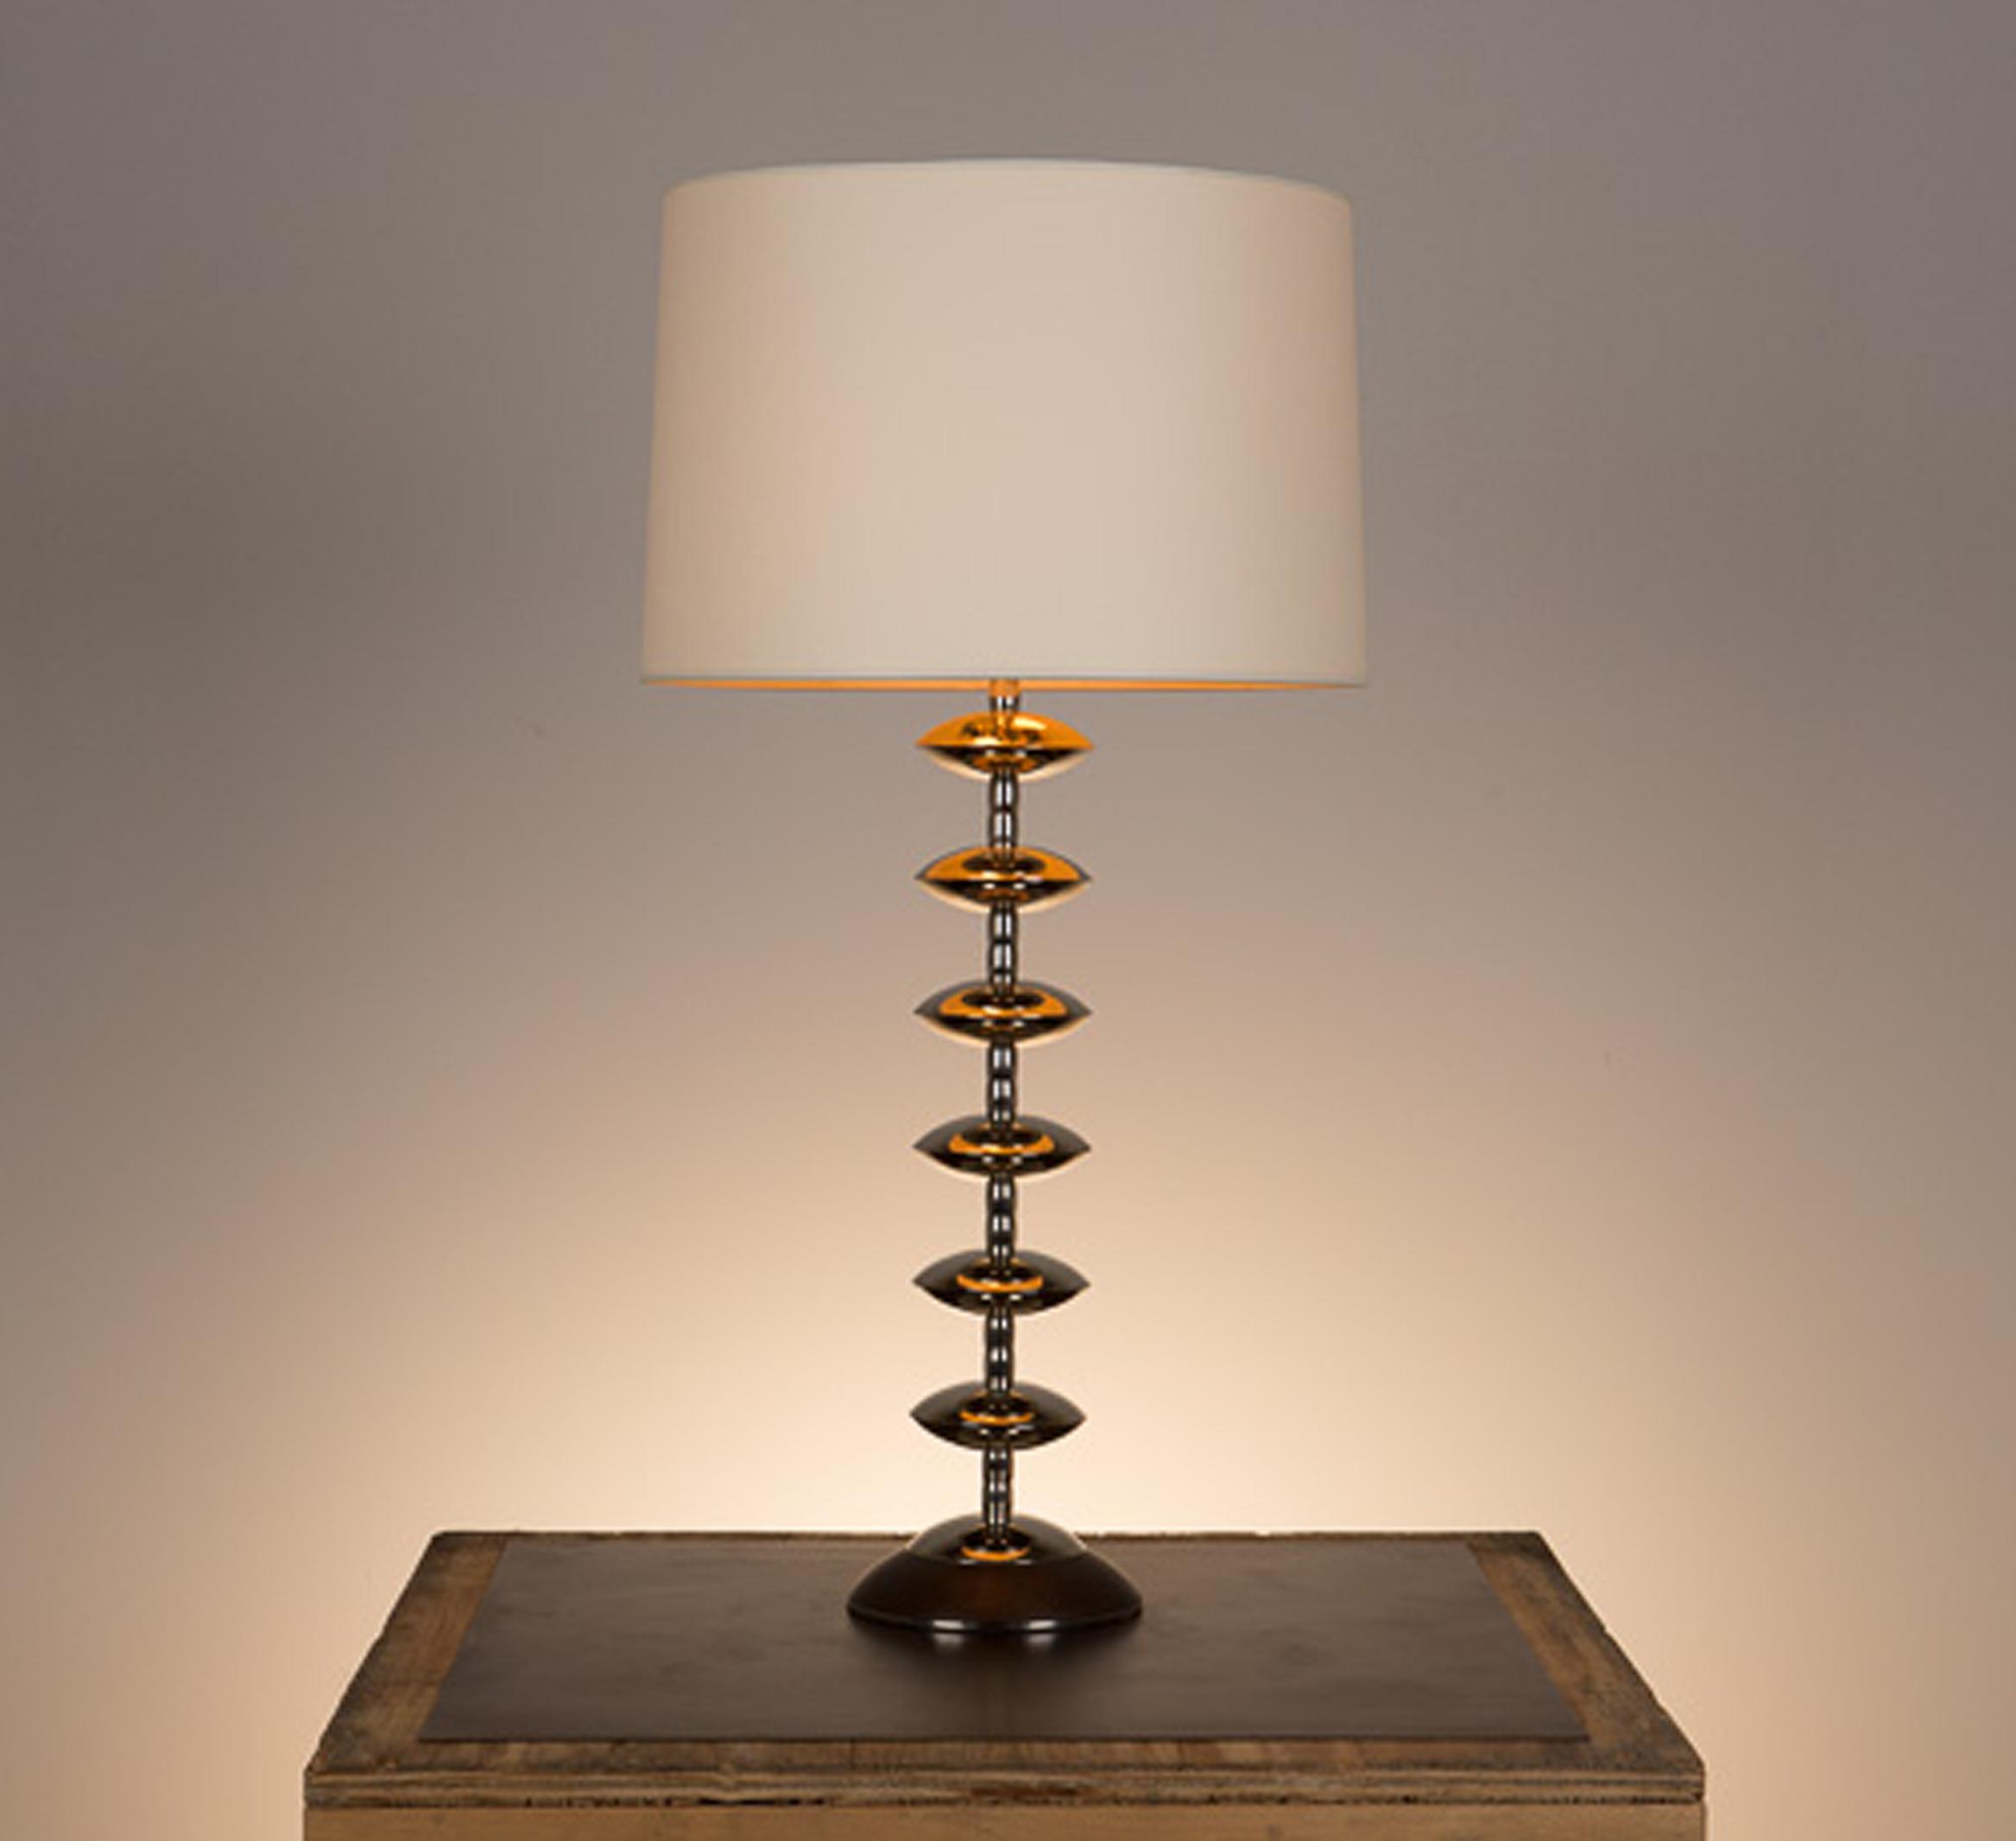 Alcazar Table Lamp #2  Kona walnut base, polished nickel fittings. Semi-closed top lamp shade in vellum.